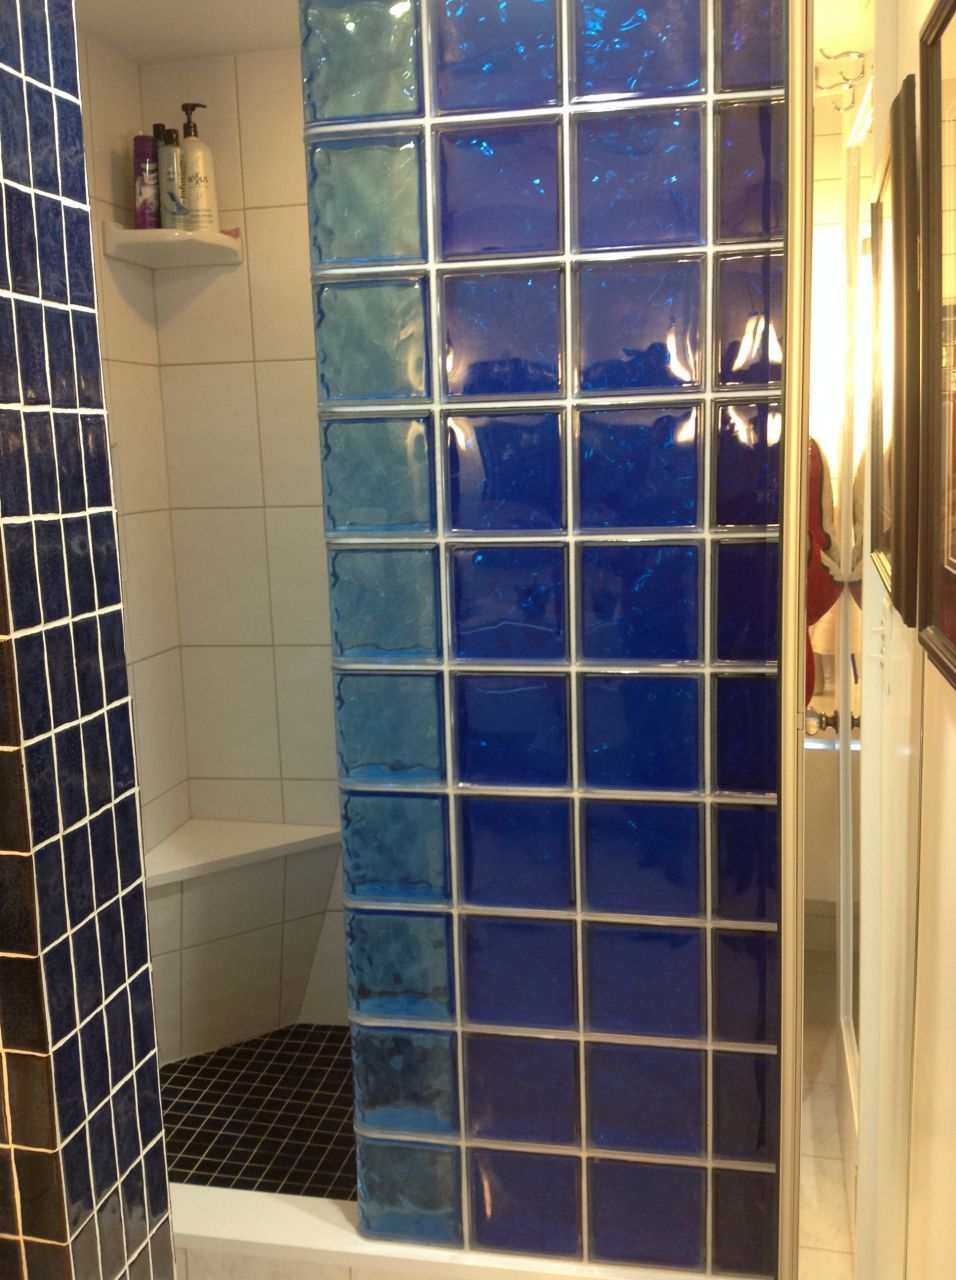 Glass block walls in bathrooms - Glass Block Walls In Bathrooms Striped Colored Glass Block Walk In Shower Wall